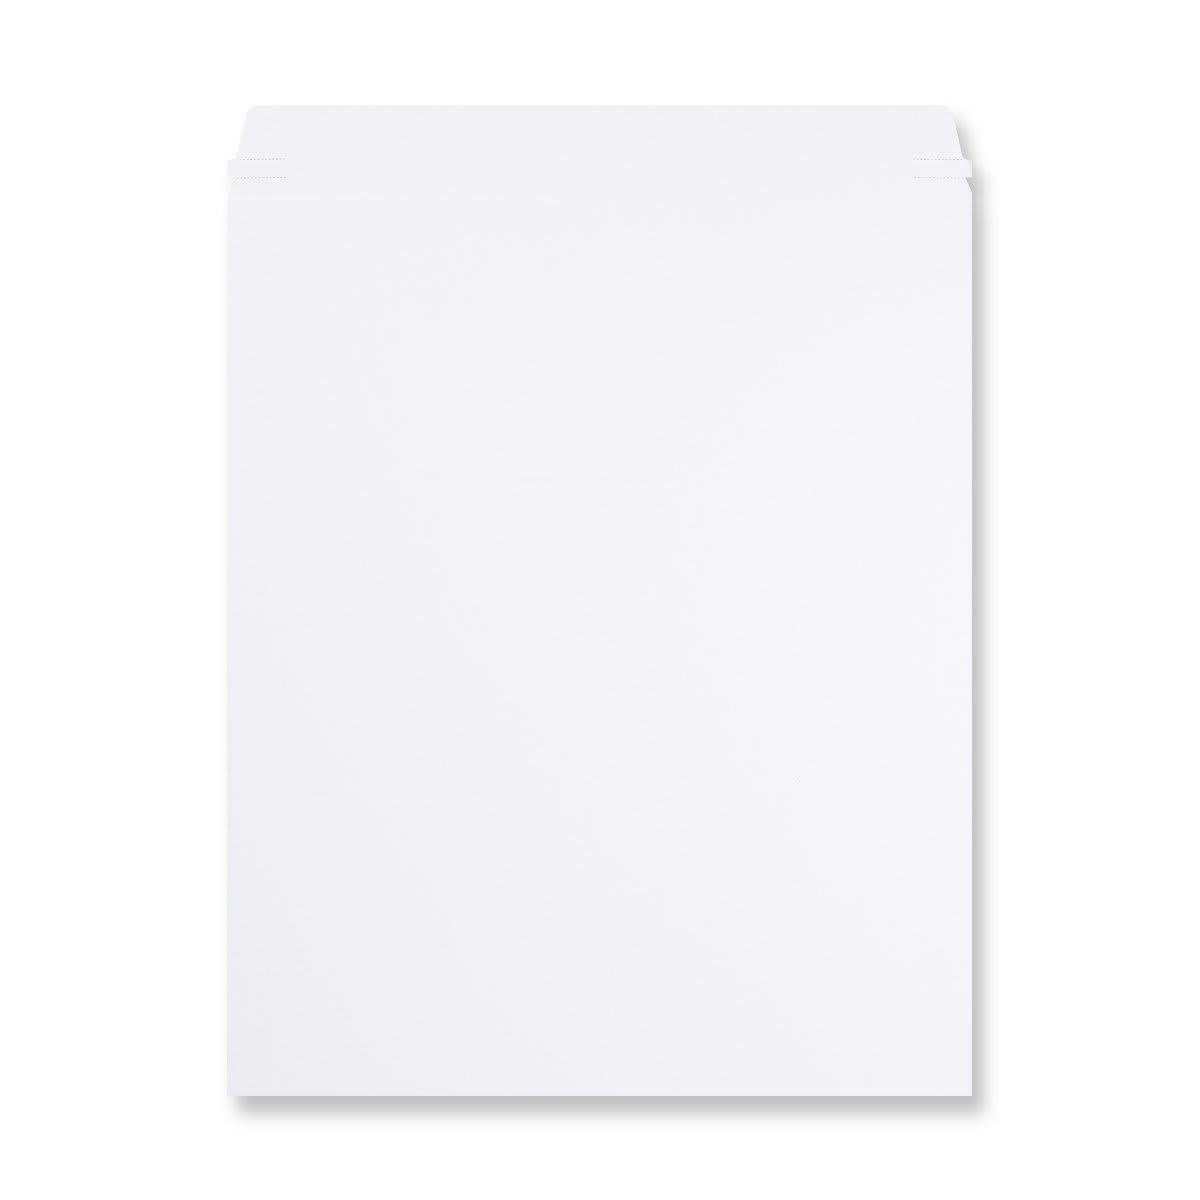 449 x 349mm WHITE ALL BOARD ENVELOPES